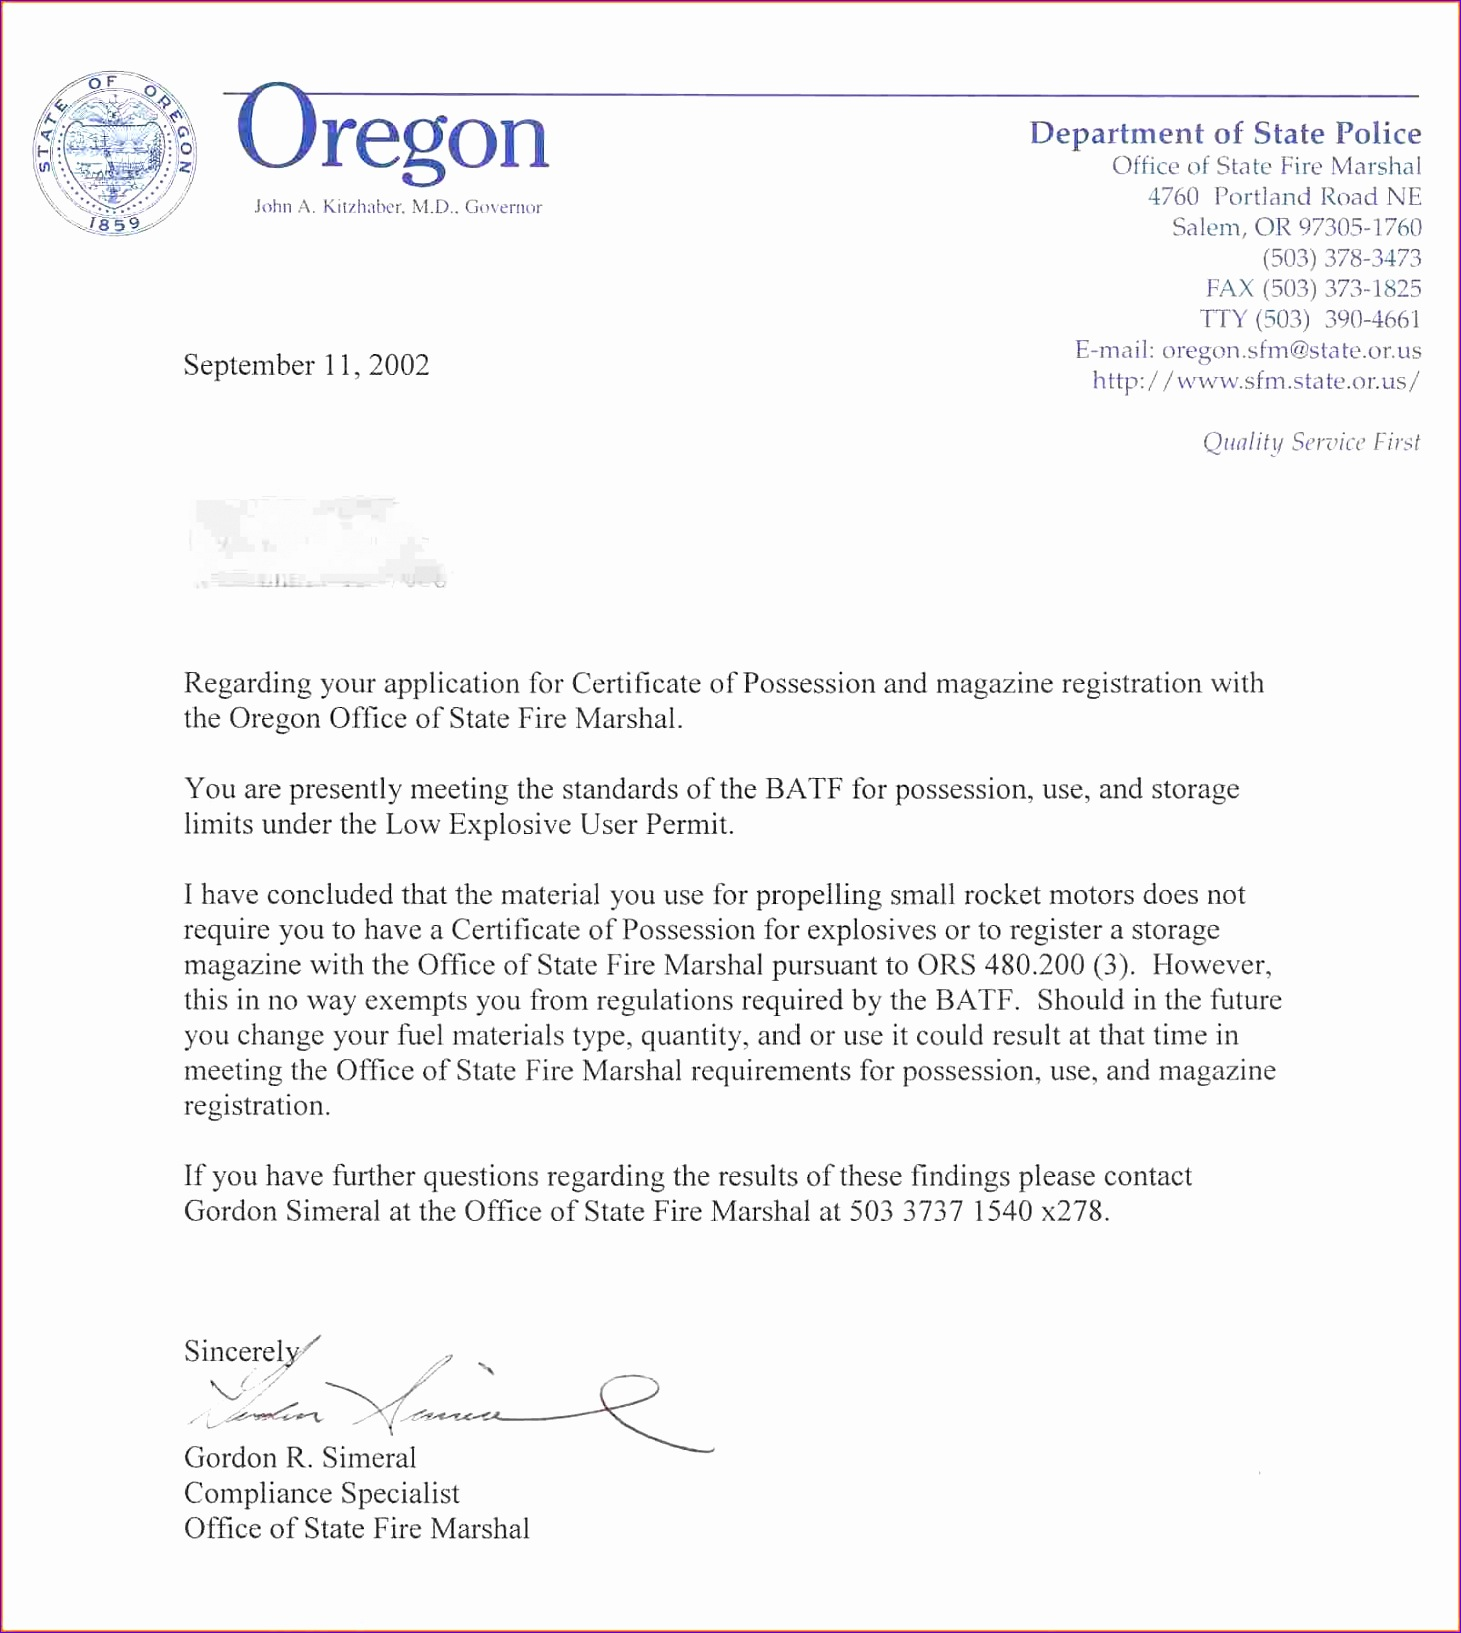 7 format official letter 14611633